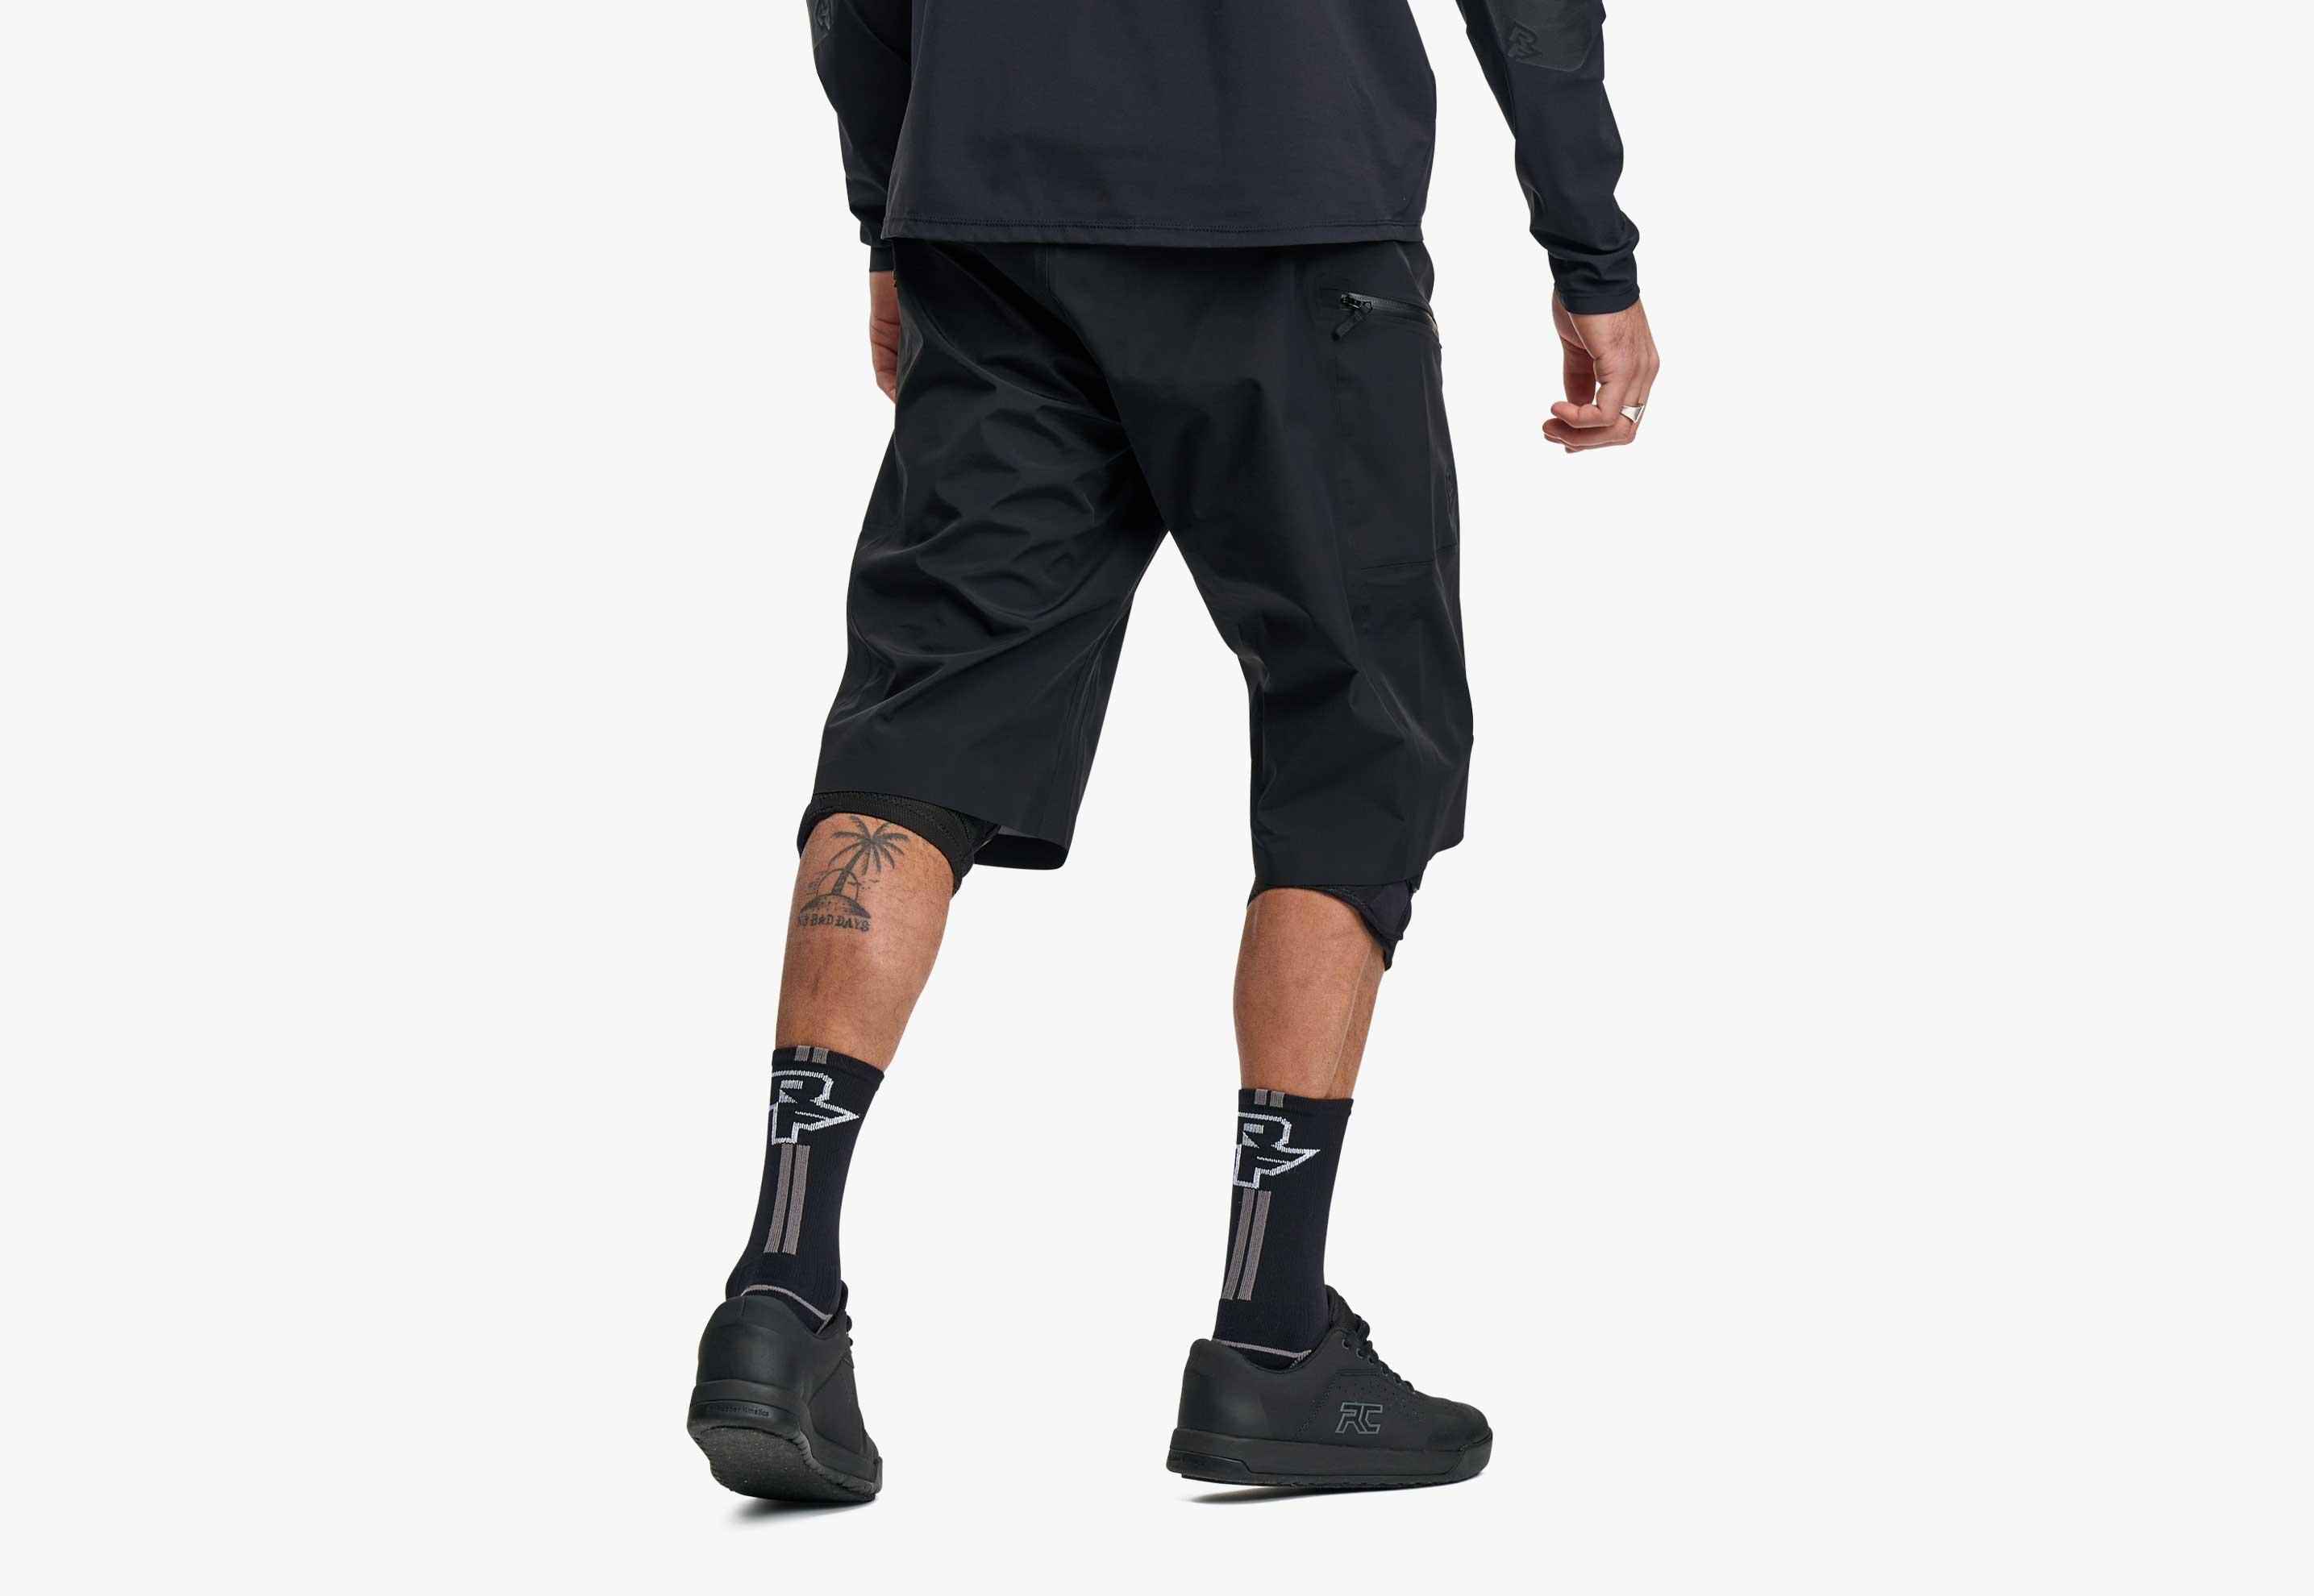 Conspiracy Shorts